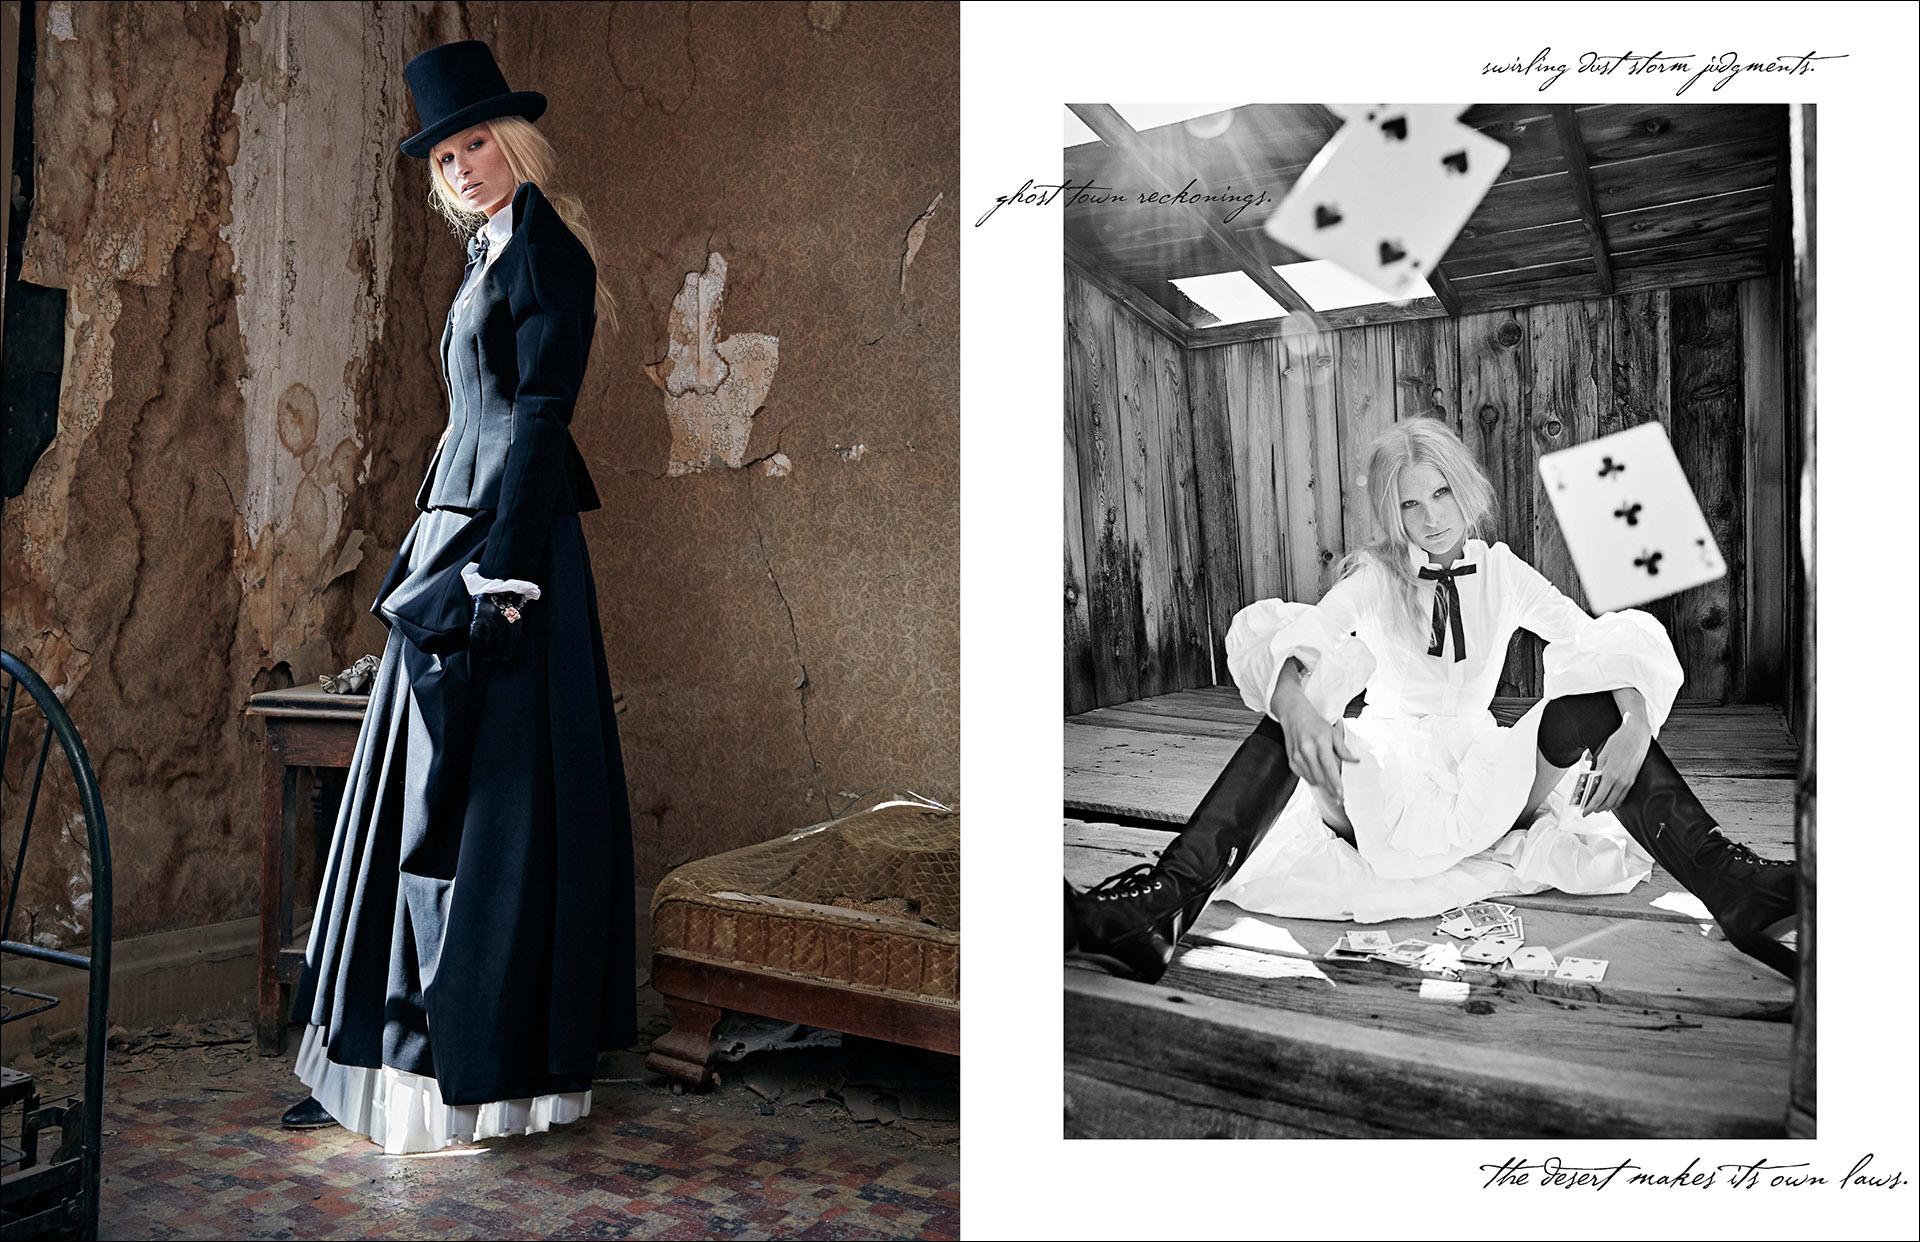 Spirit-&-Flesh-Magazine_LAS-DESPERADAS_by_MEG-WEBSTER_and_ATHANASIA-NICHOLS_09